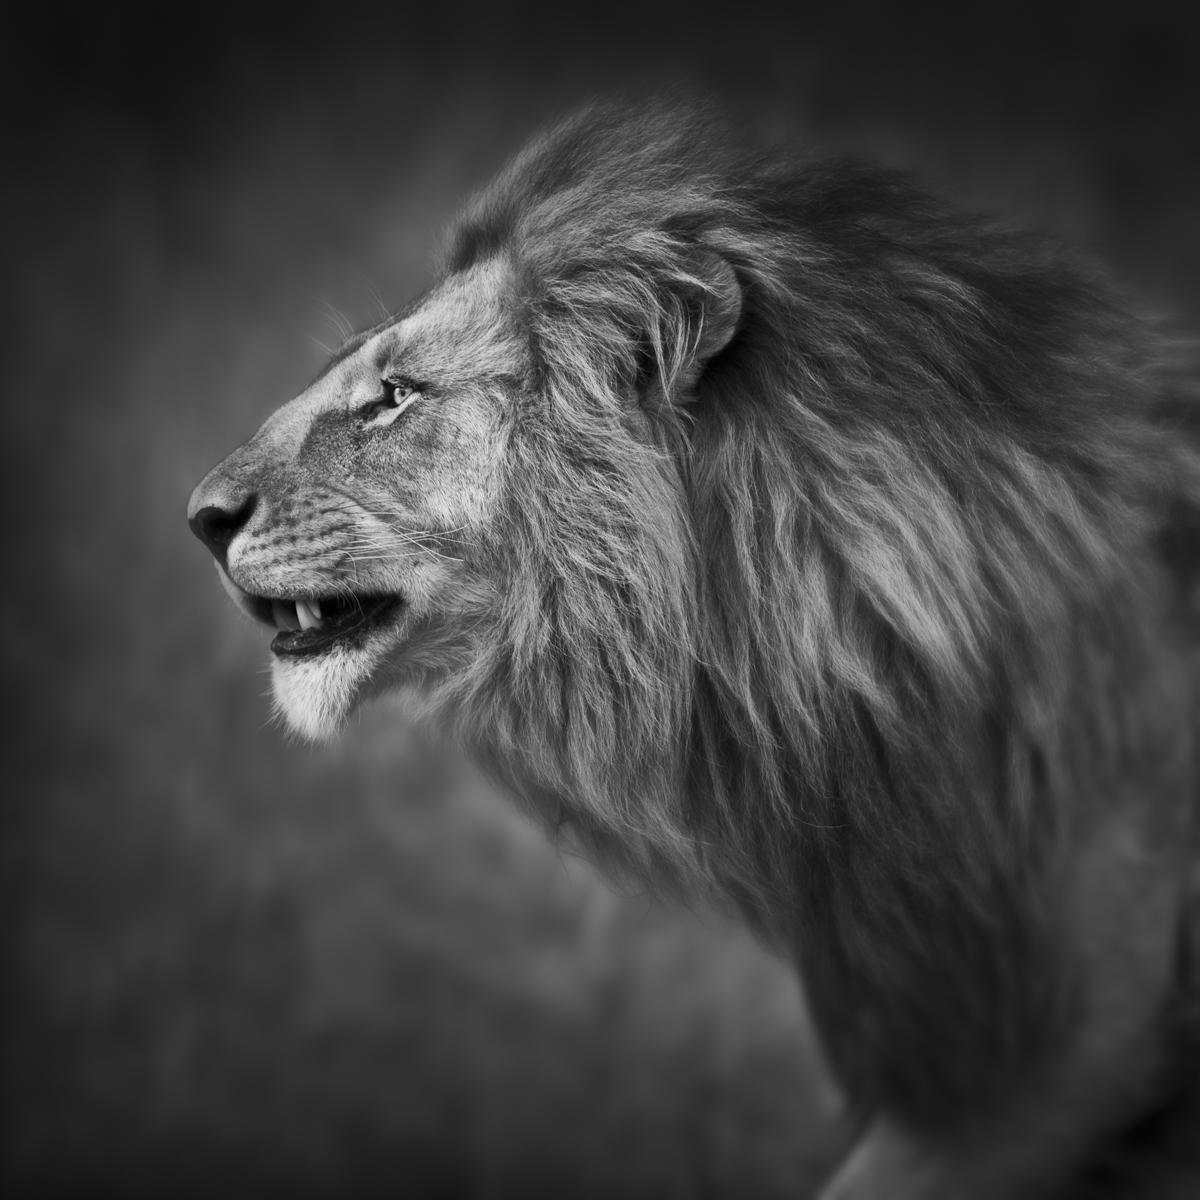 Lion Portrait - Maasai Mara, Kenya